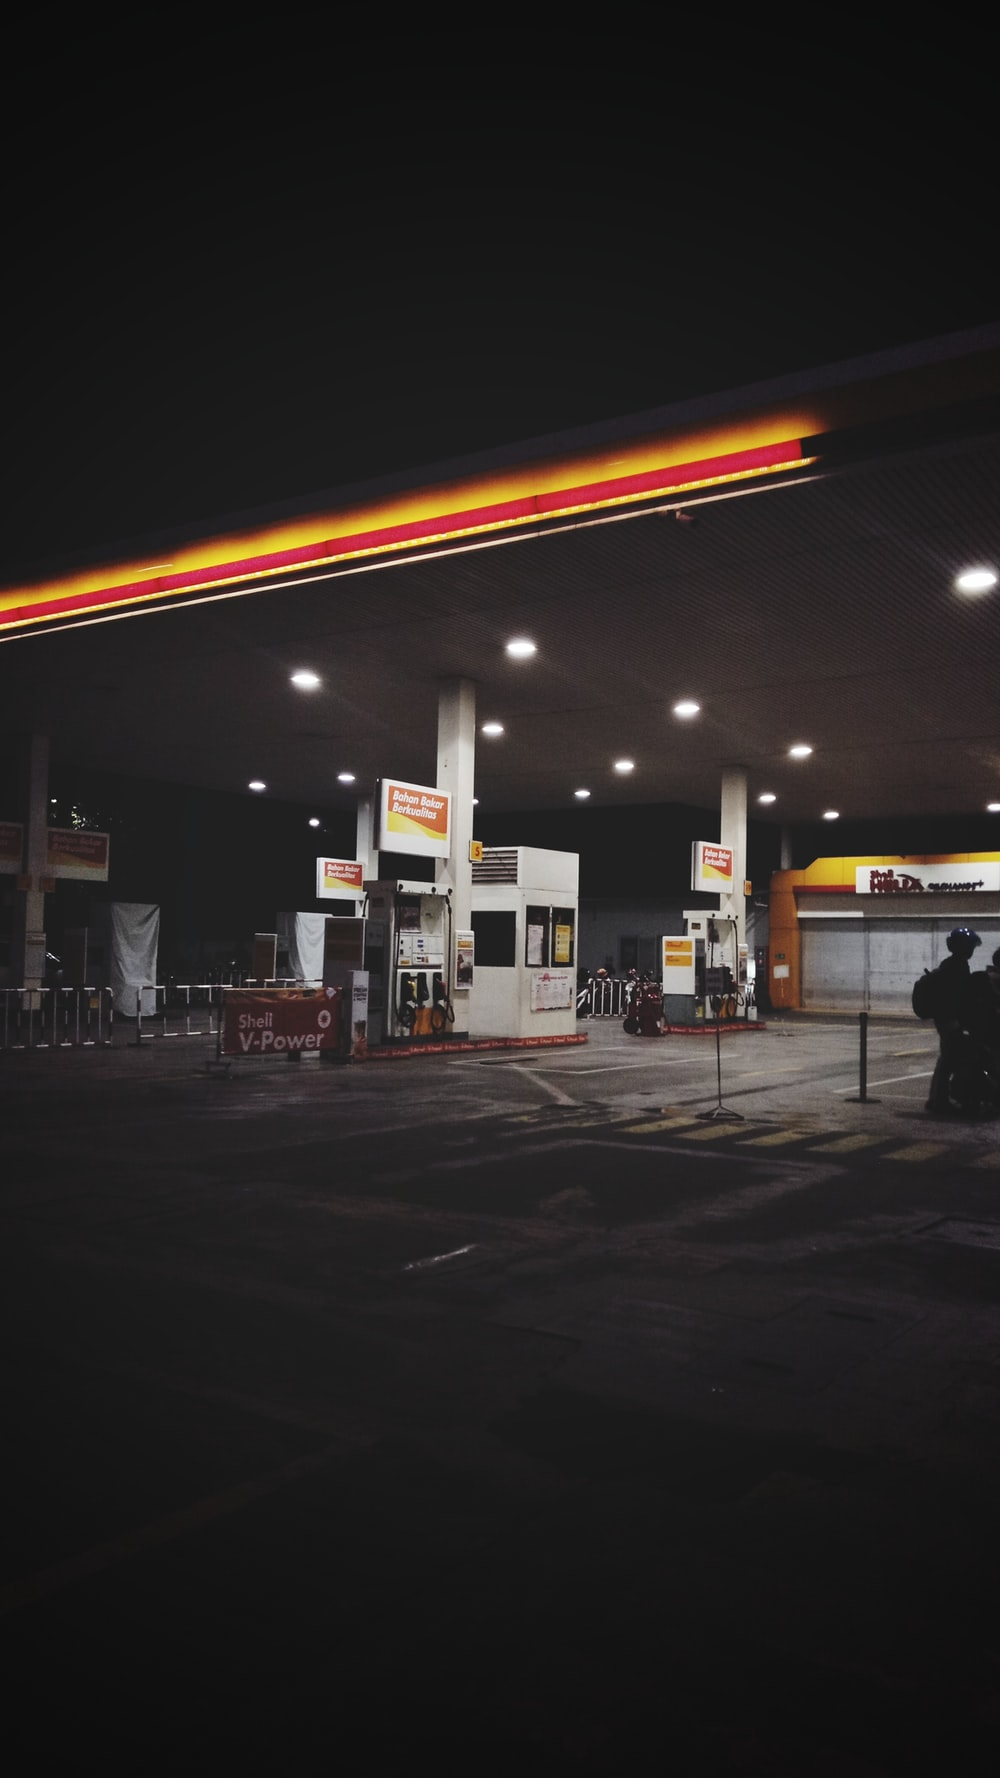 white gasoline station at night